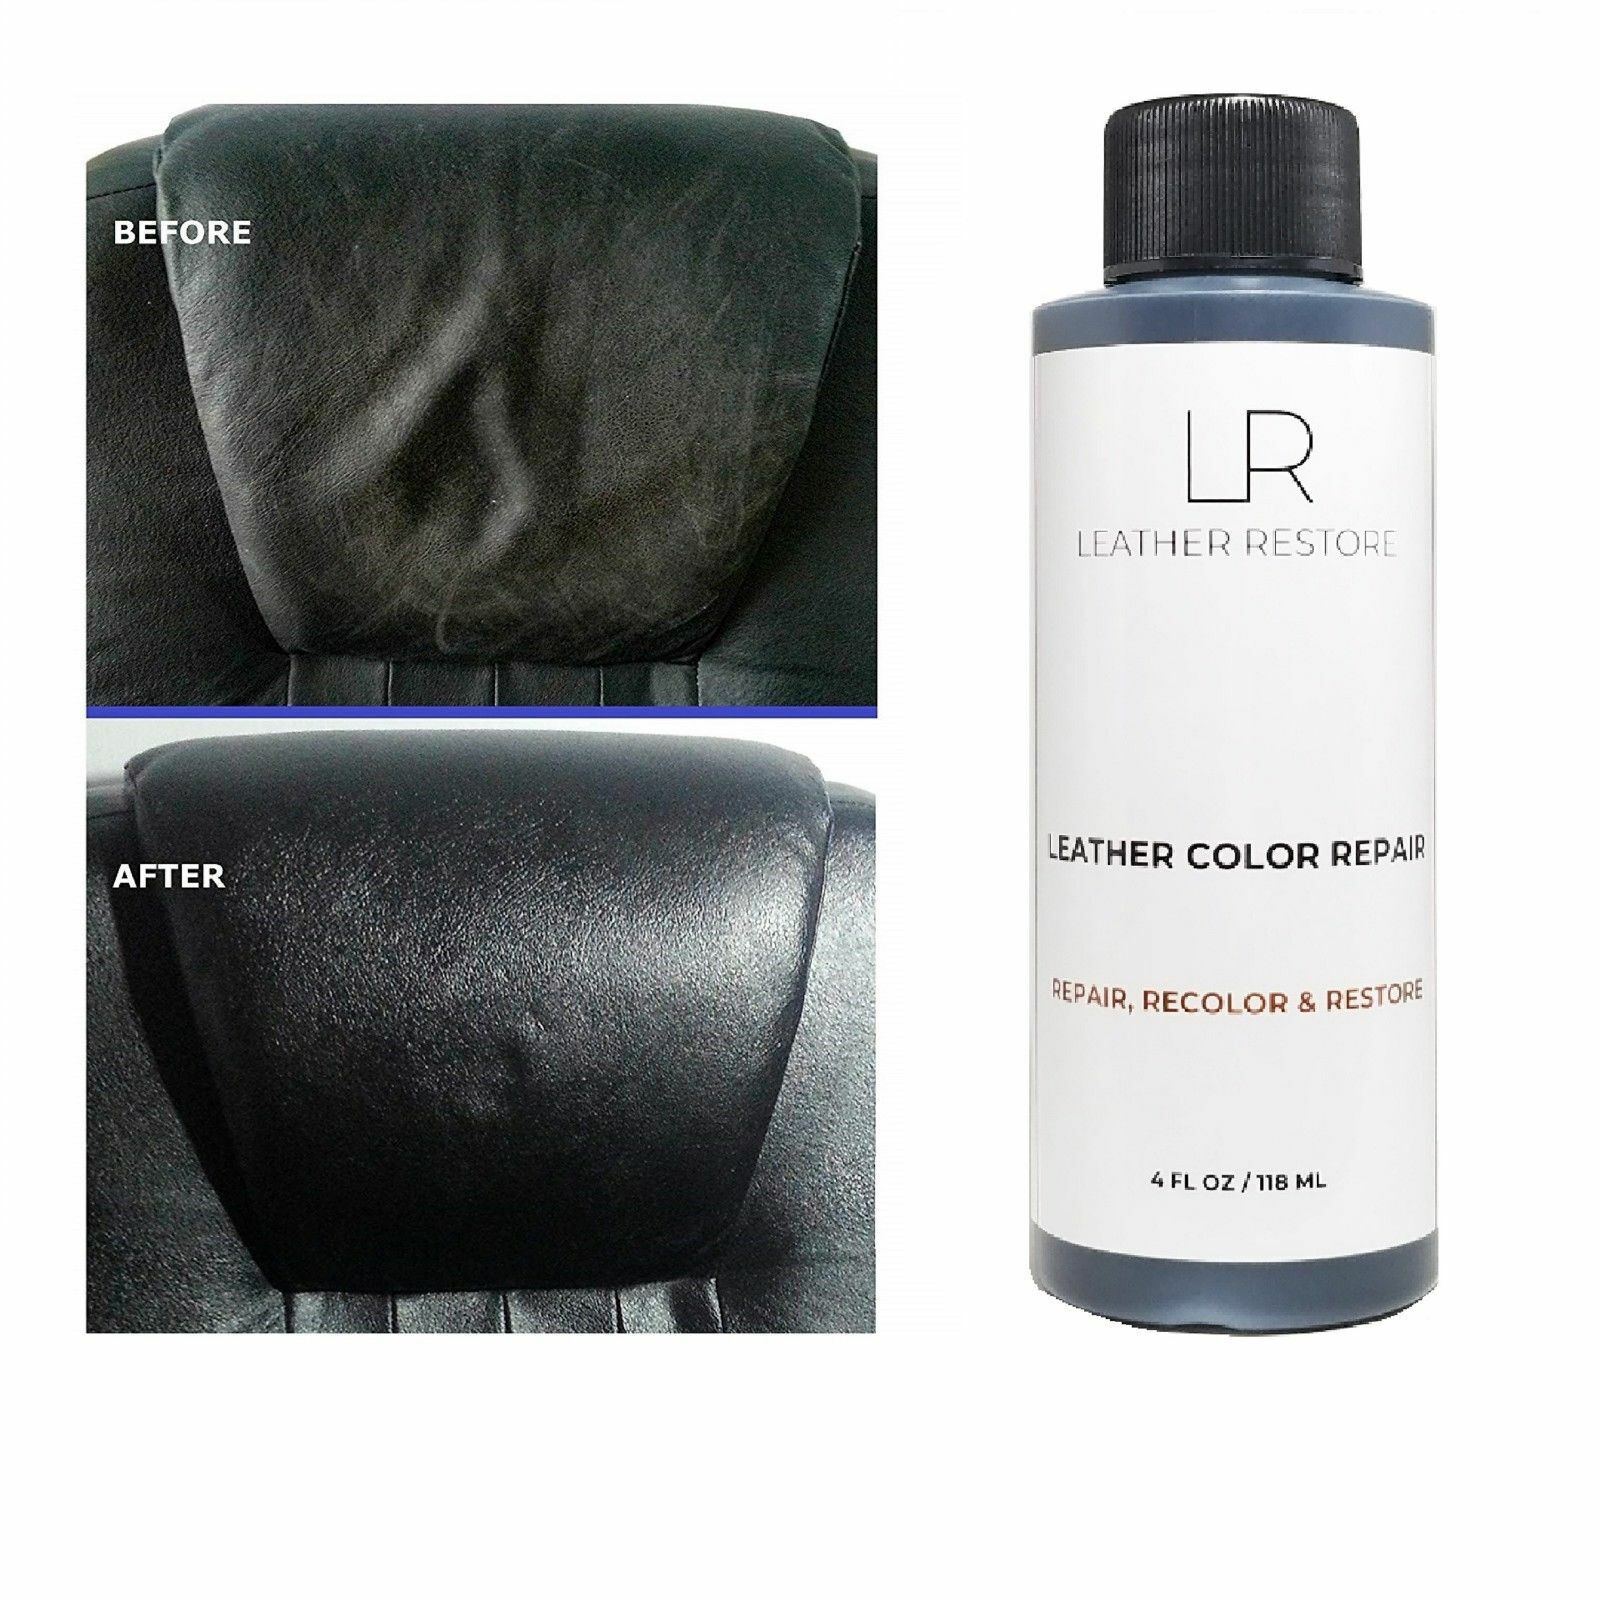 Espresso Very Dark Brown Leather Color Repair 4Oz Recolor Restorer Couch Car  - $15.95